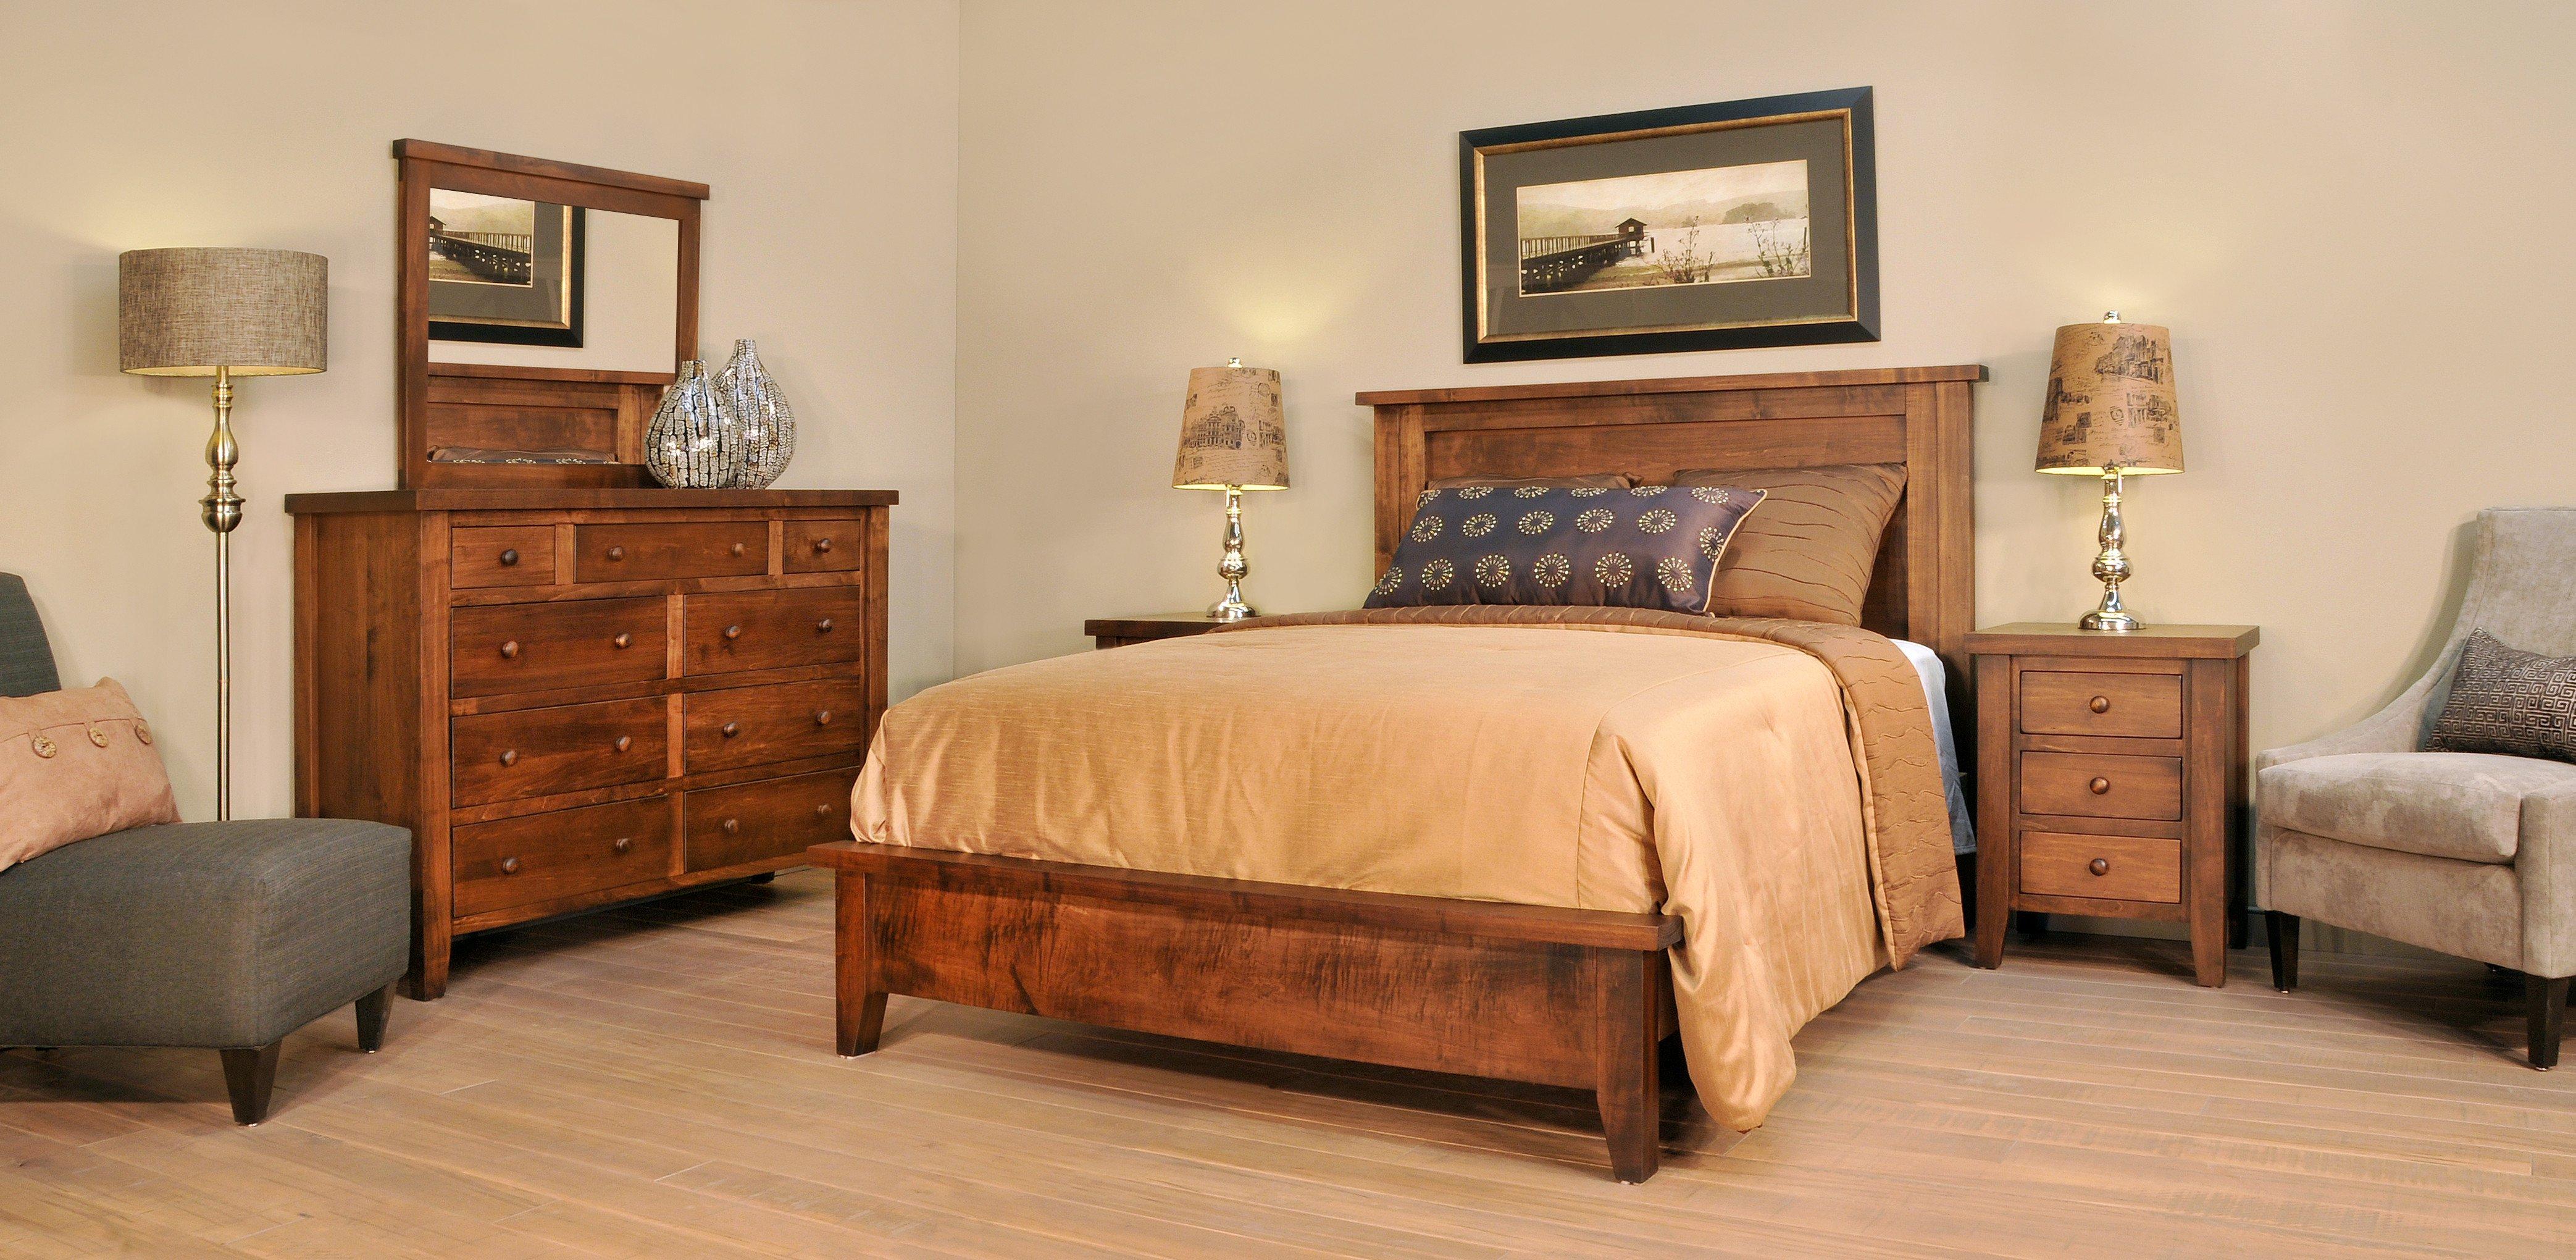 Solid Oak Bedroom Furniture Beautiful Ruff Sawn Farm House Bedroom Amish solid Wood